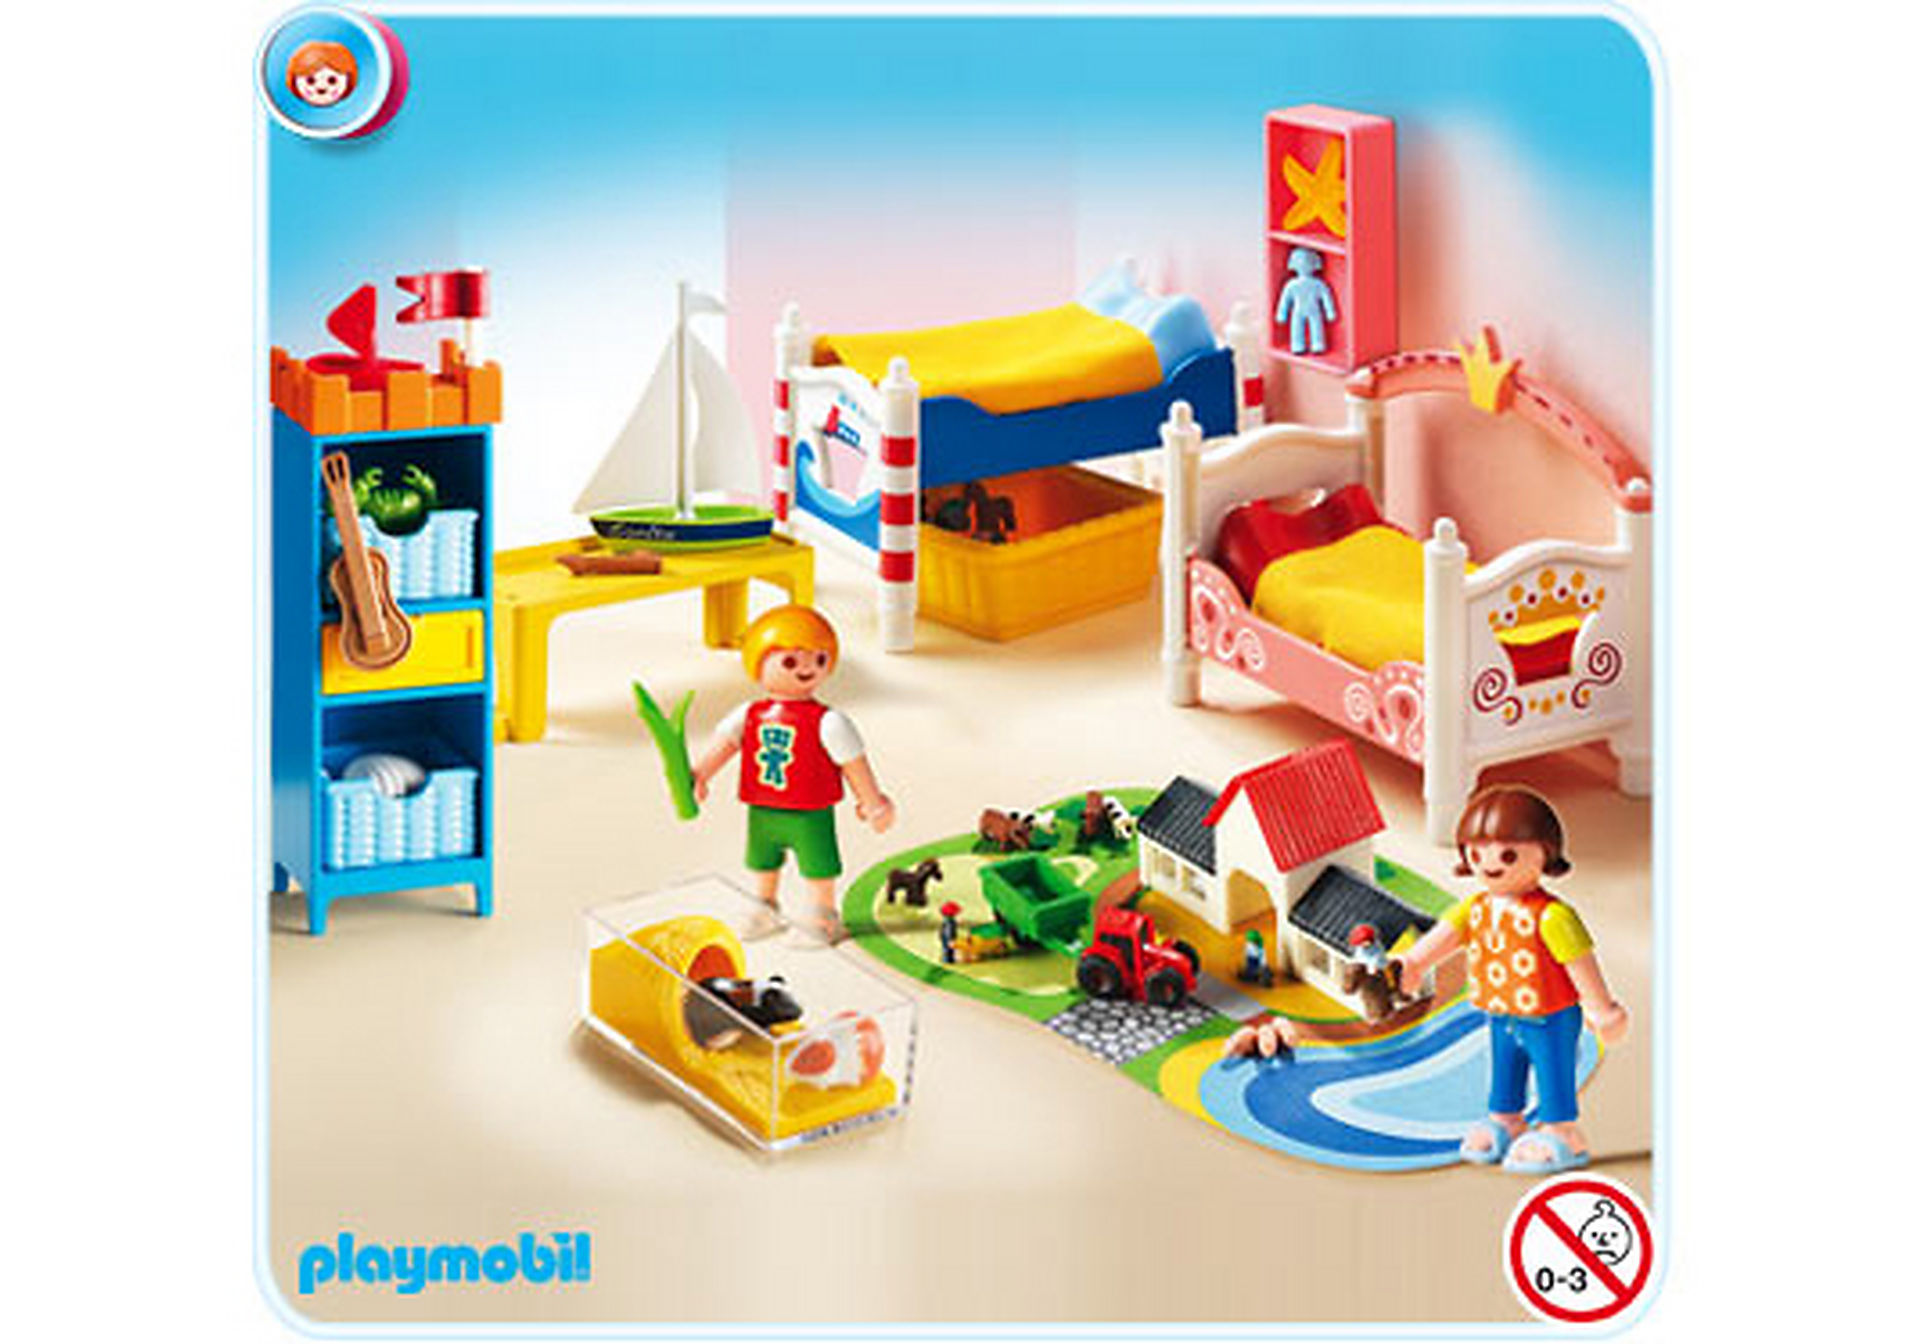 http://media.playmobil.com/i/playmobil/5333-A_product_detail/Chambre des enfants avec lits décorés